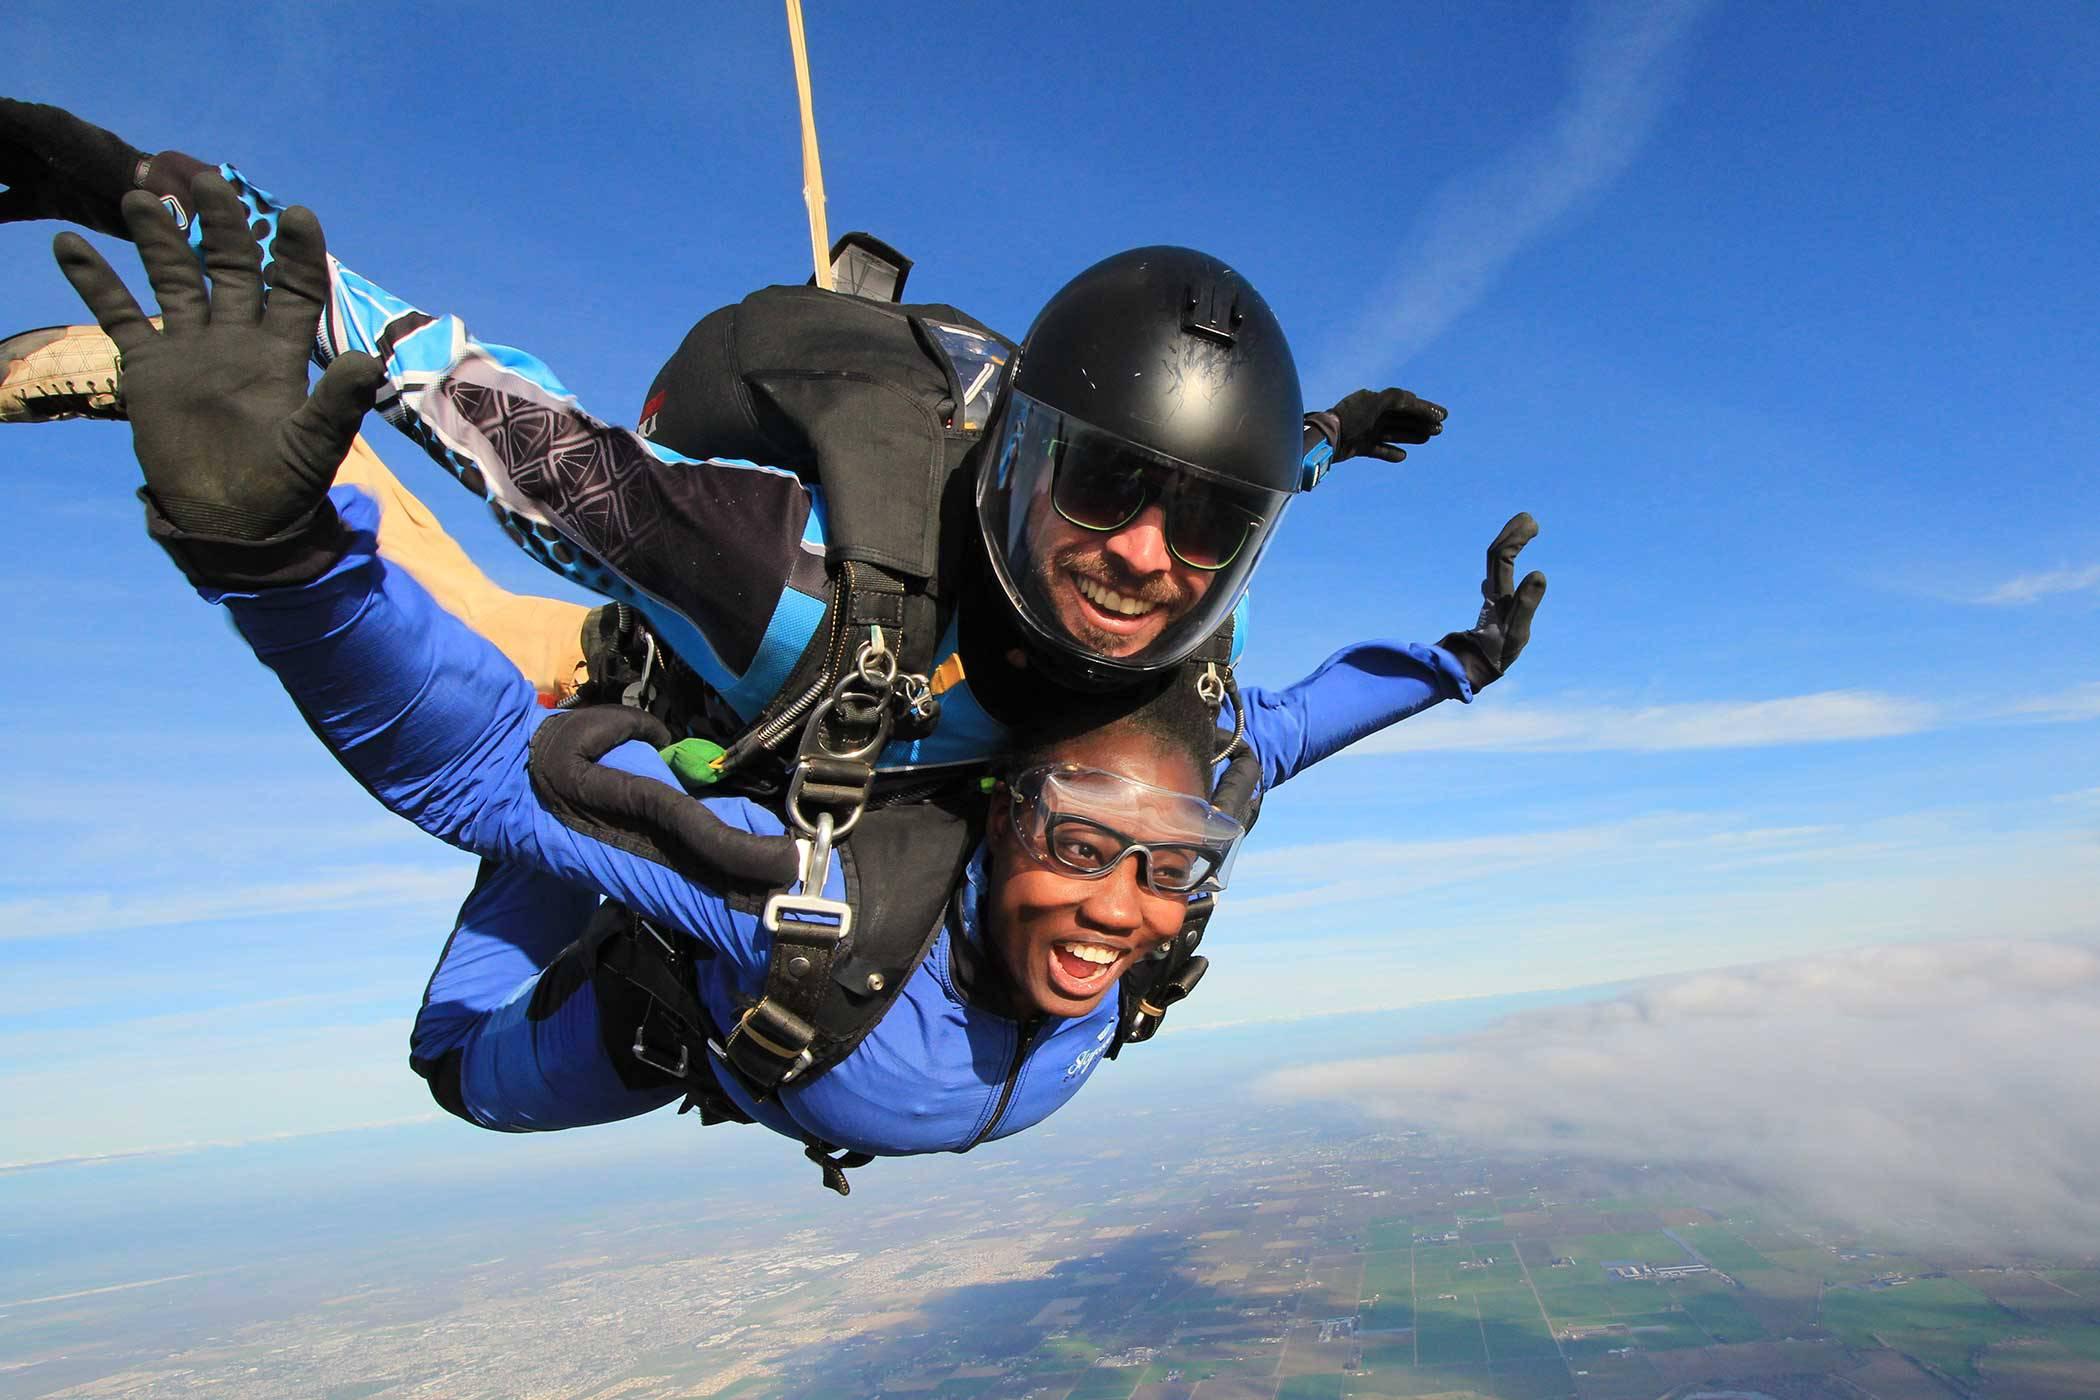 Skydiving Doesn't Discriminate | Skydive California